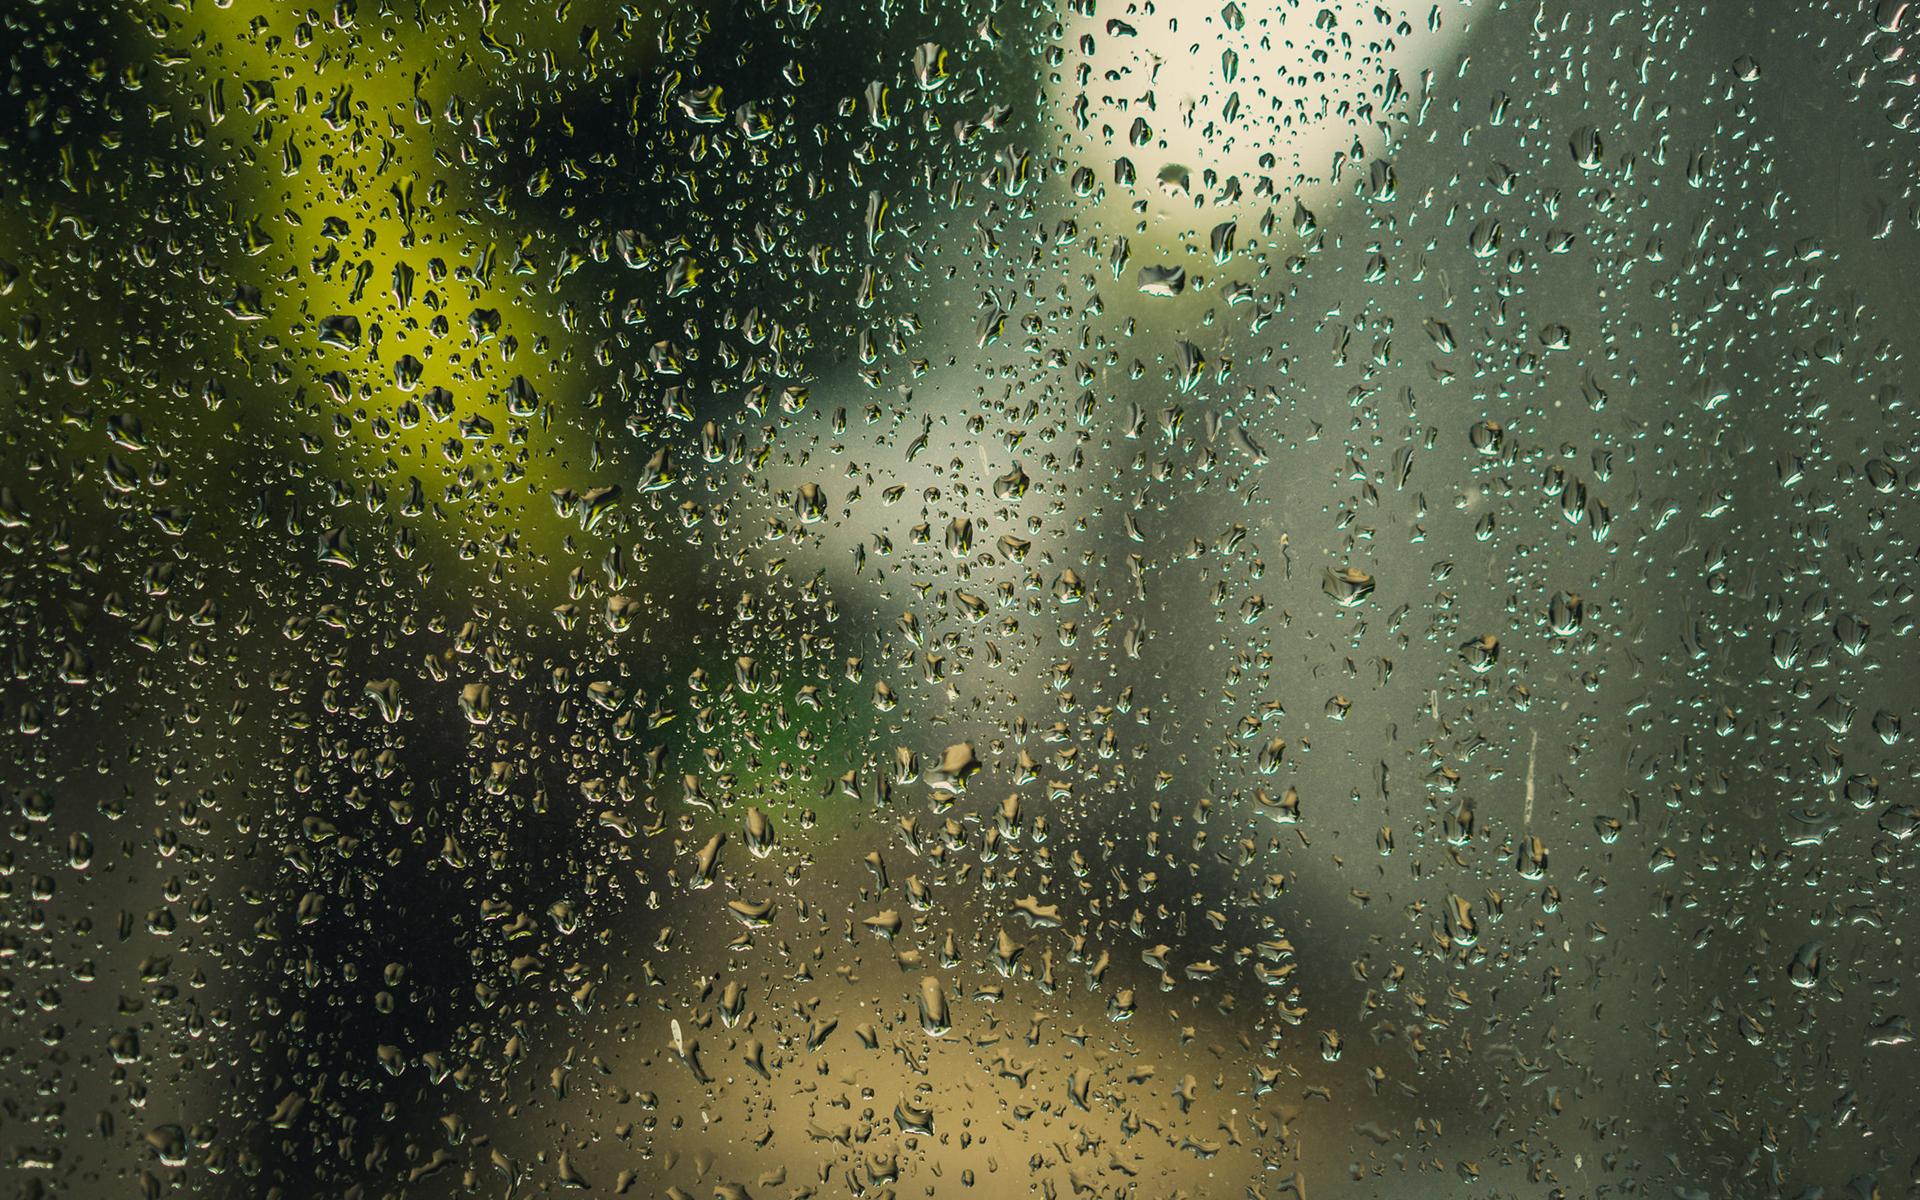 Эффект капель дождя на фото